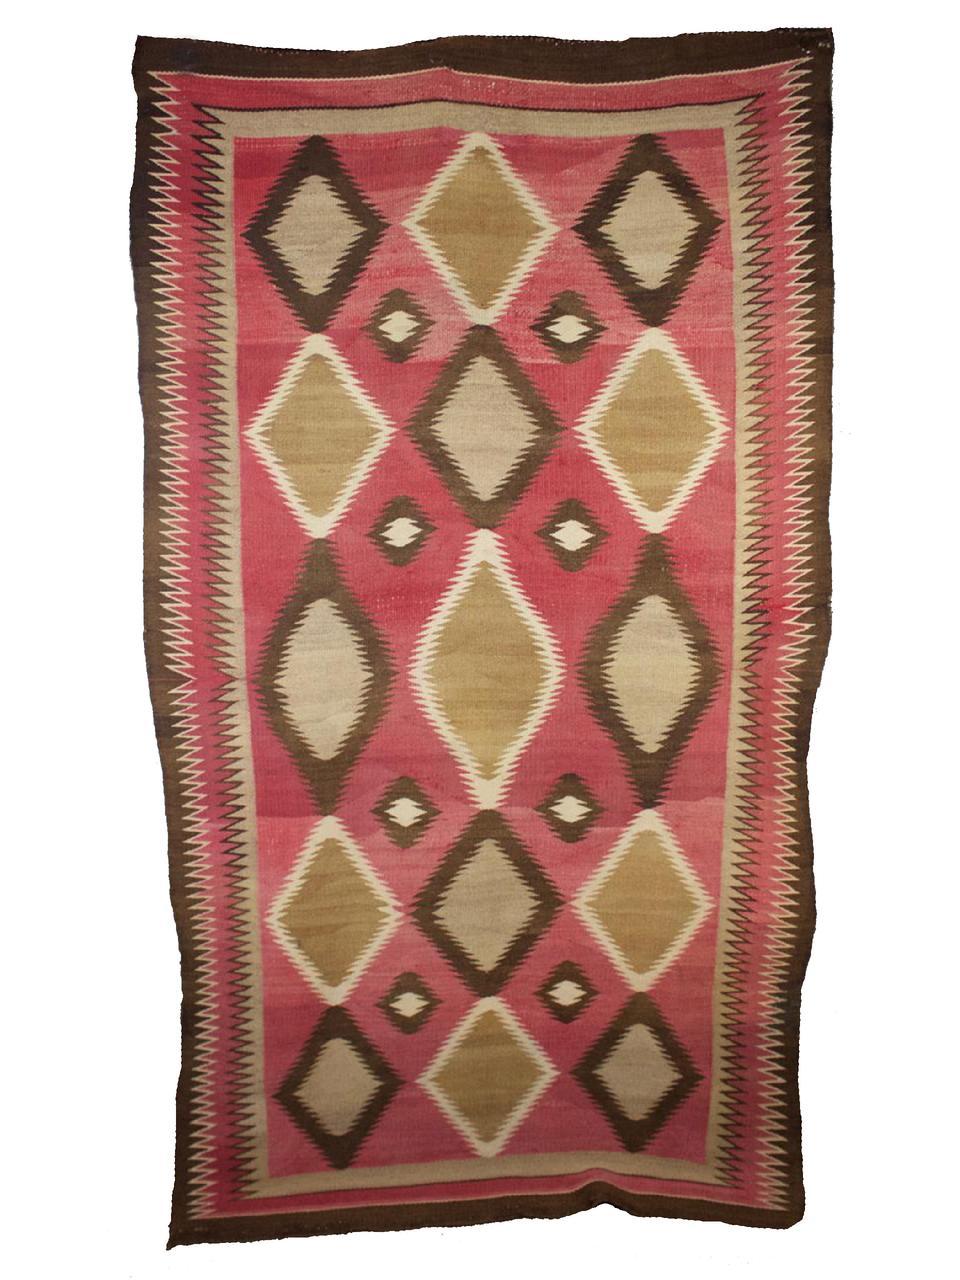 "Red Mesa Navajo Weaving c.1920s - 1930s 86"" x 44"" // CWS0005"